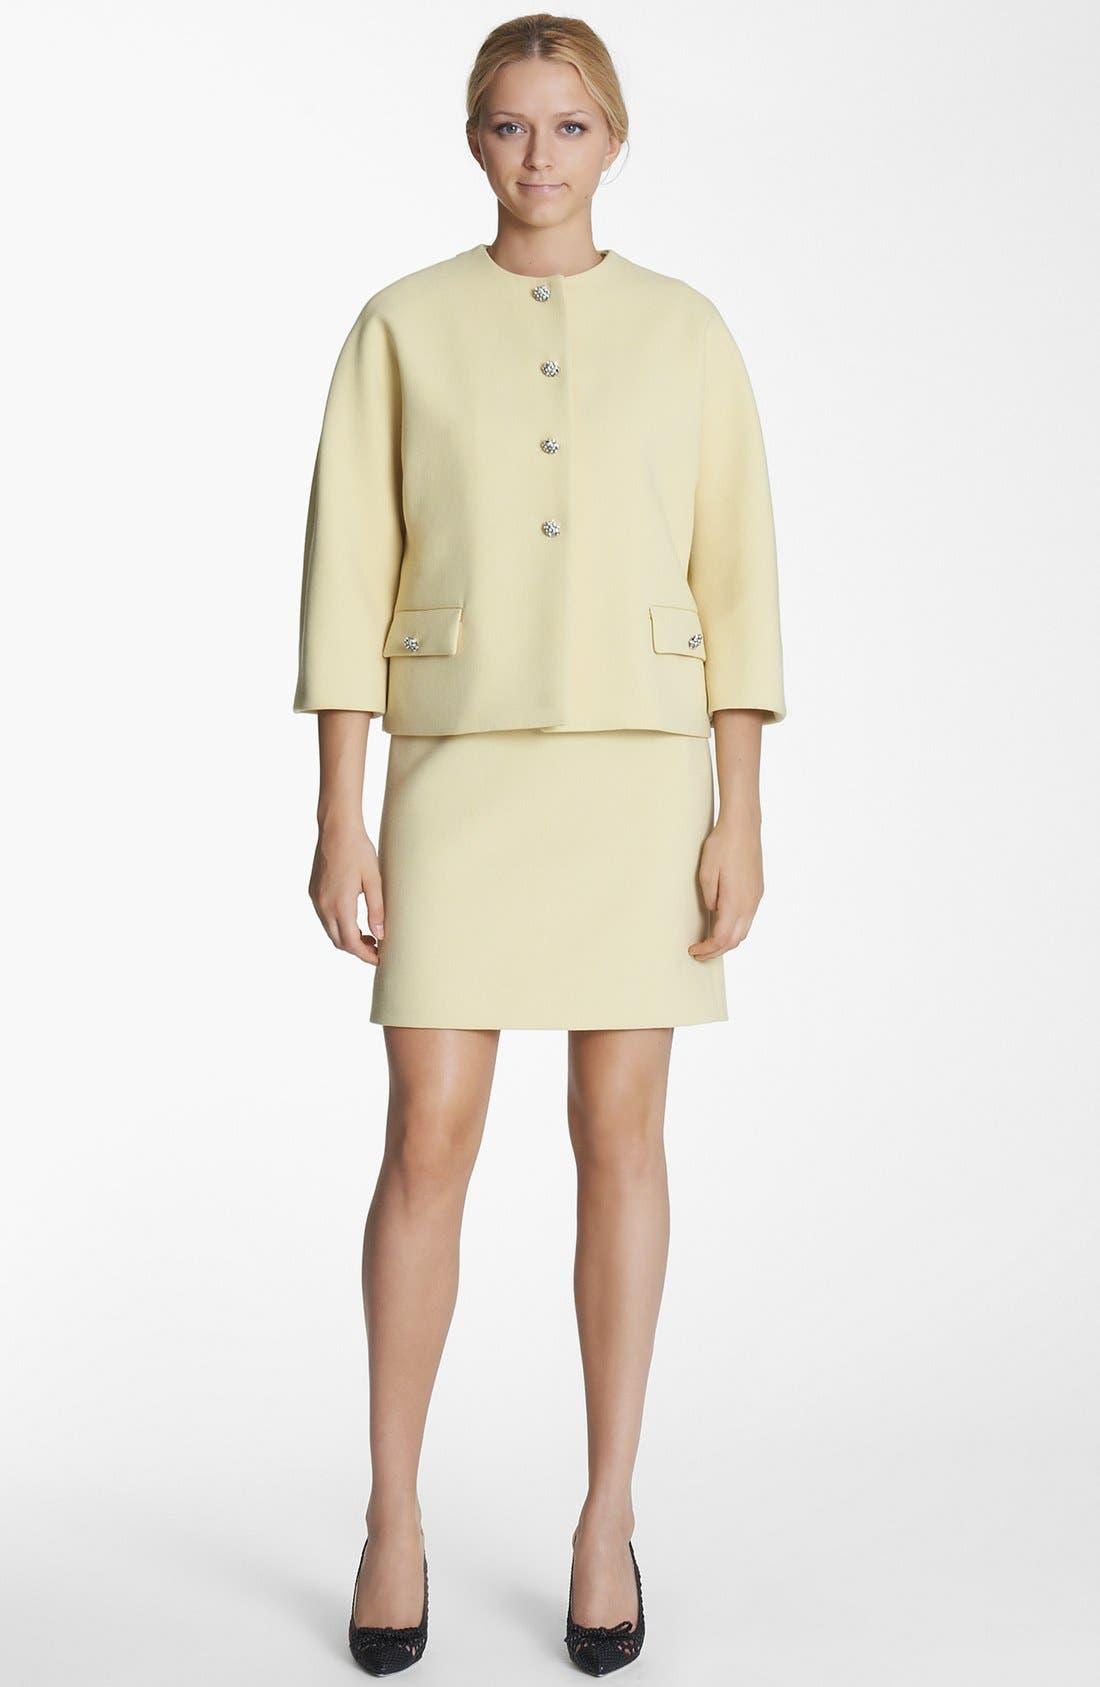 Alternate Image 1 Selected - Dolce&Gabbana Crystal Button Crepe Jacket